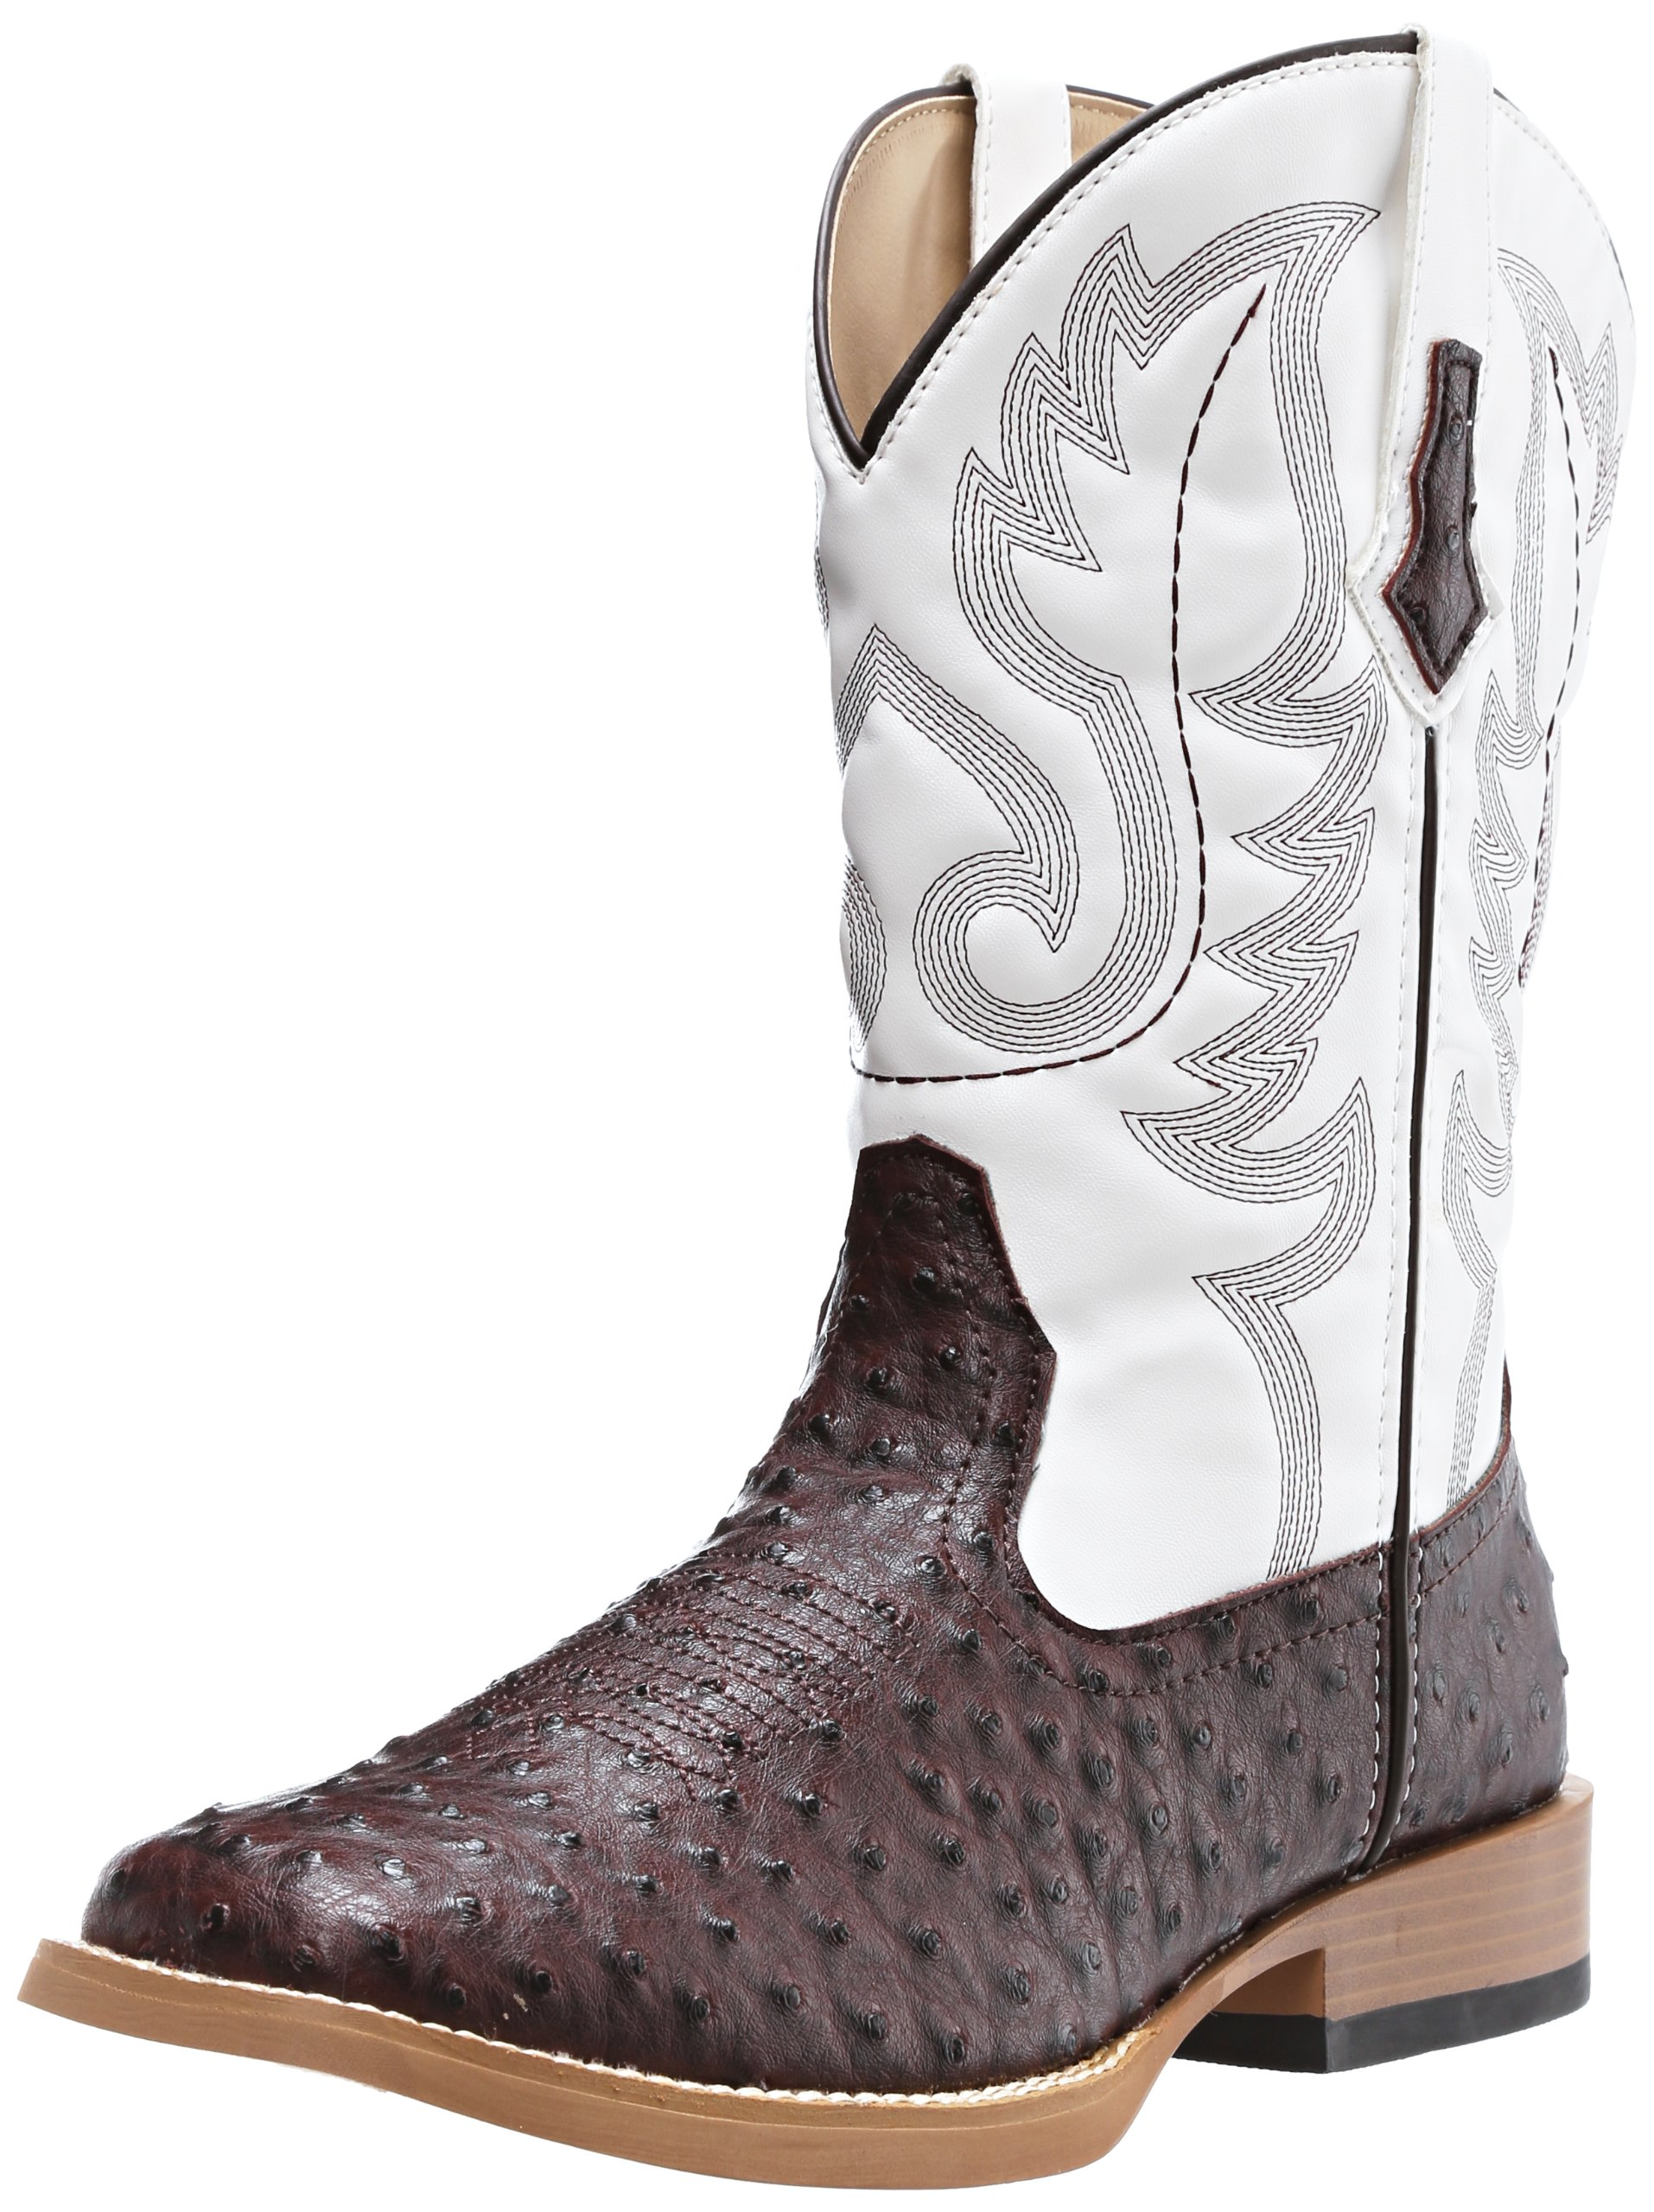 ROPER Men's Ostrich Print Square Toe Cowboy Boot, Brown Faux Leather/Western Stitch, 10 D-Medium by ROPER